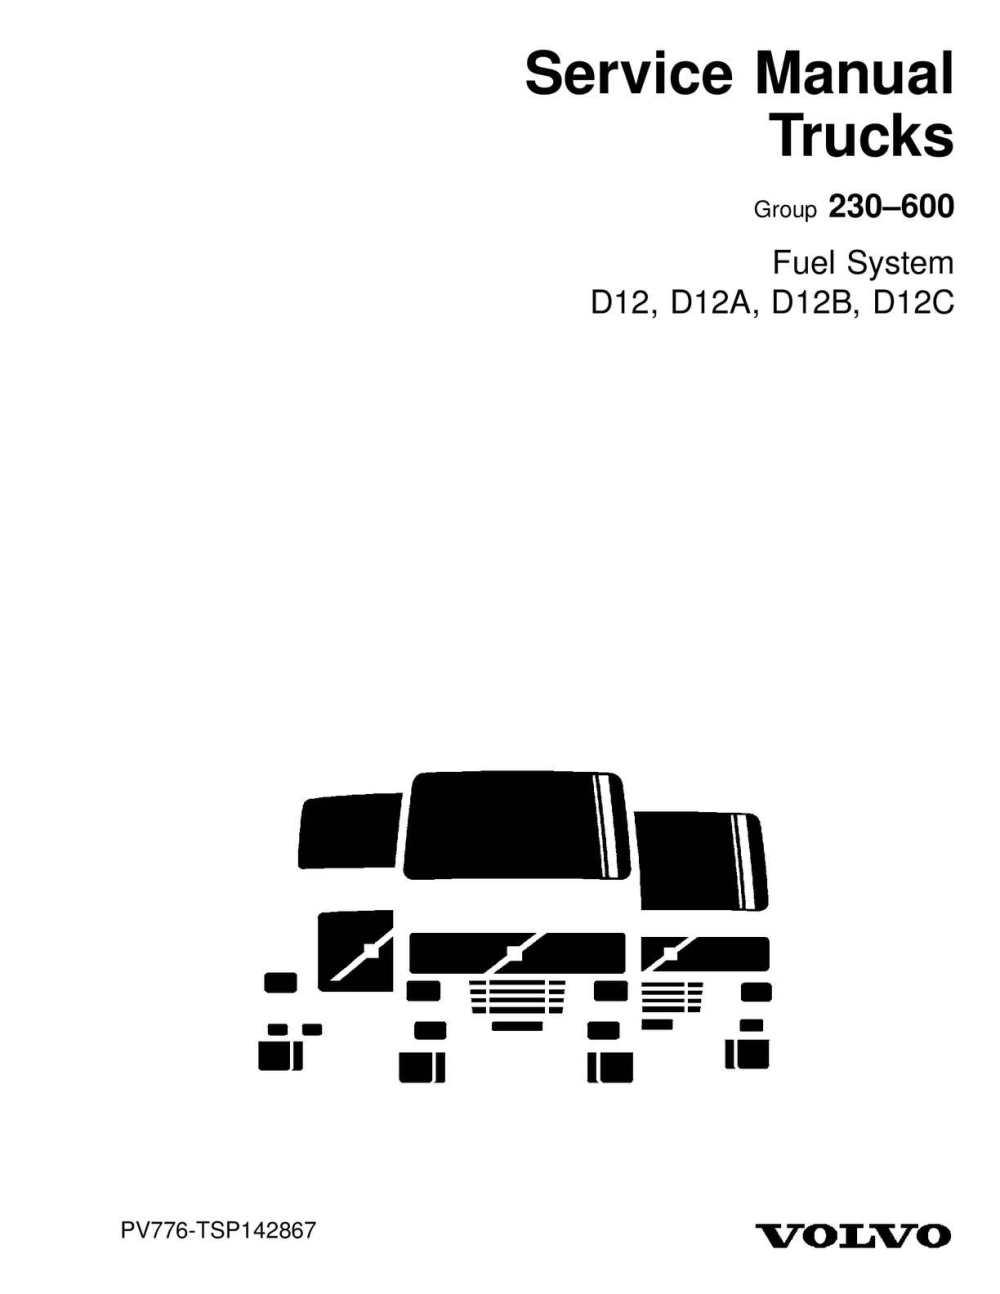 medium resolution of volvo fuel system d12 d12a d12b d12c